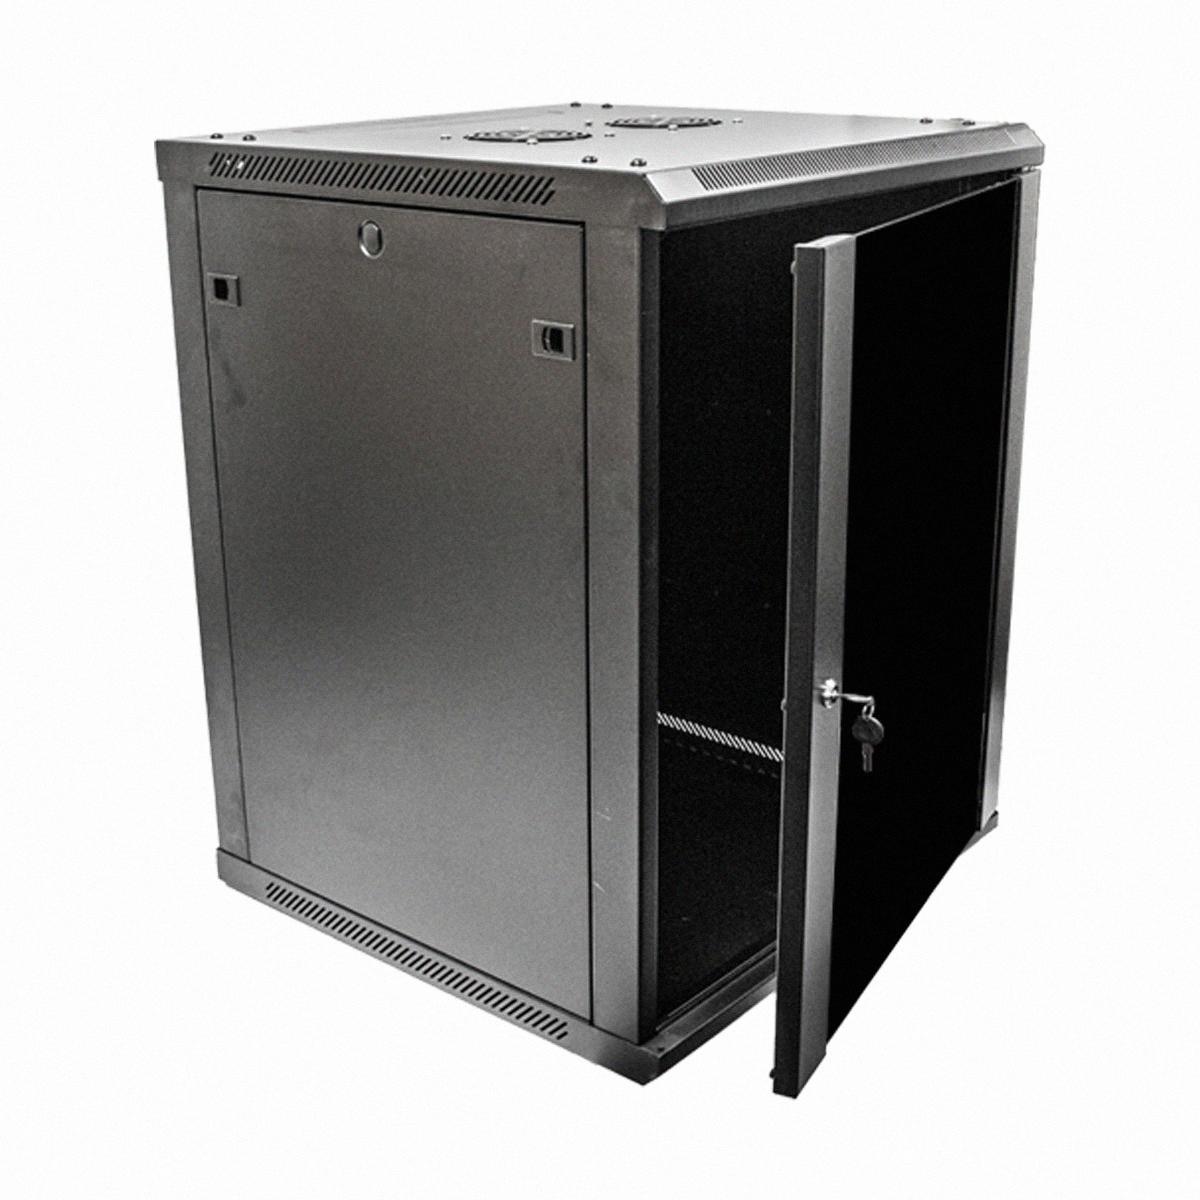 15U Wall Mount Network Server Data Cabinet 24inch Depth Glass Door Lock  Key  eBay